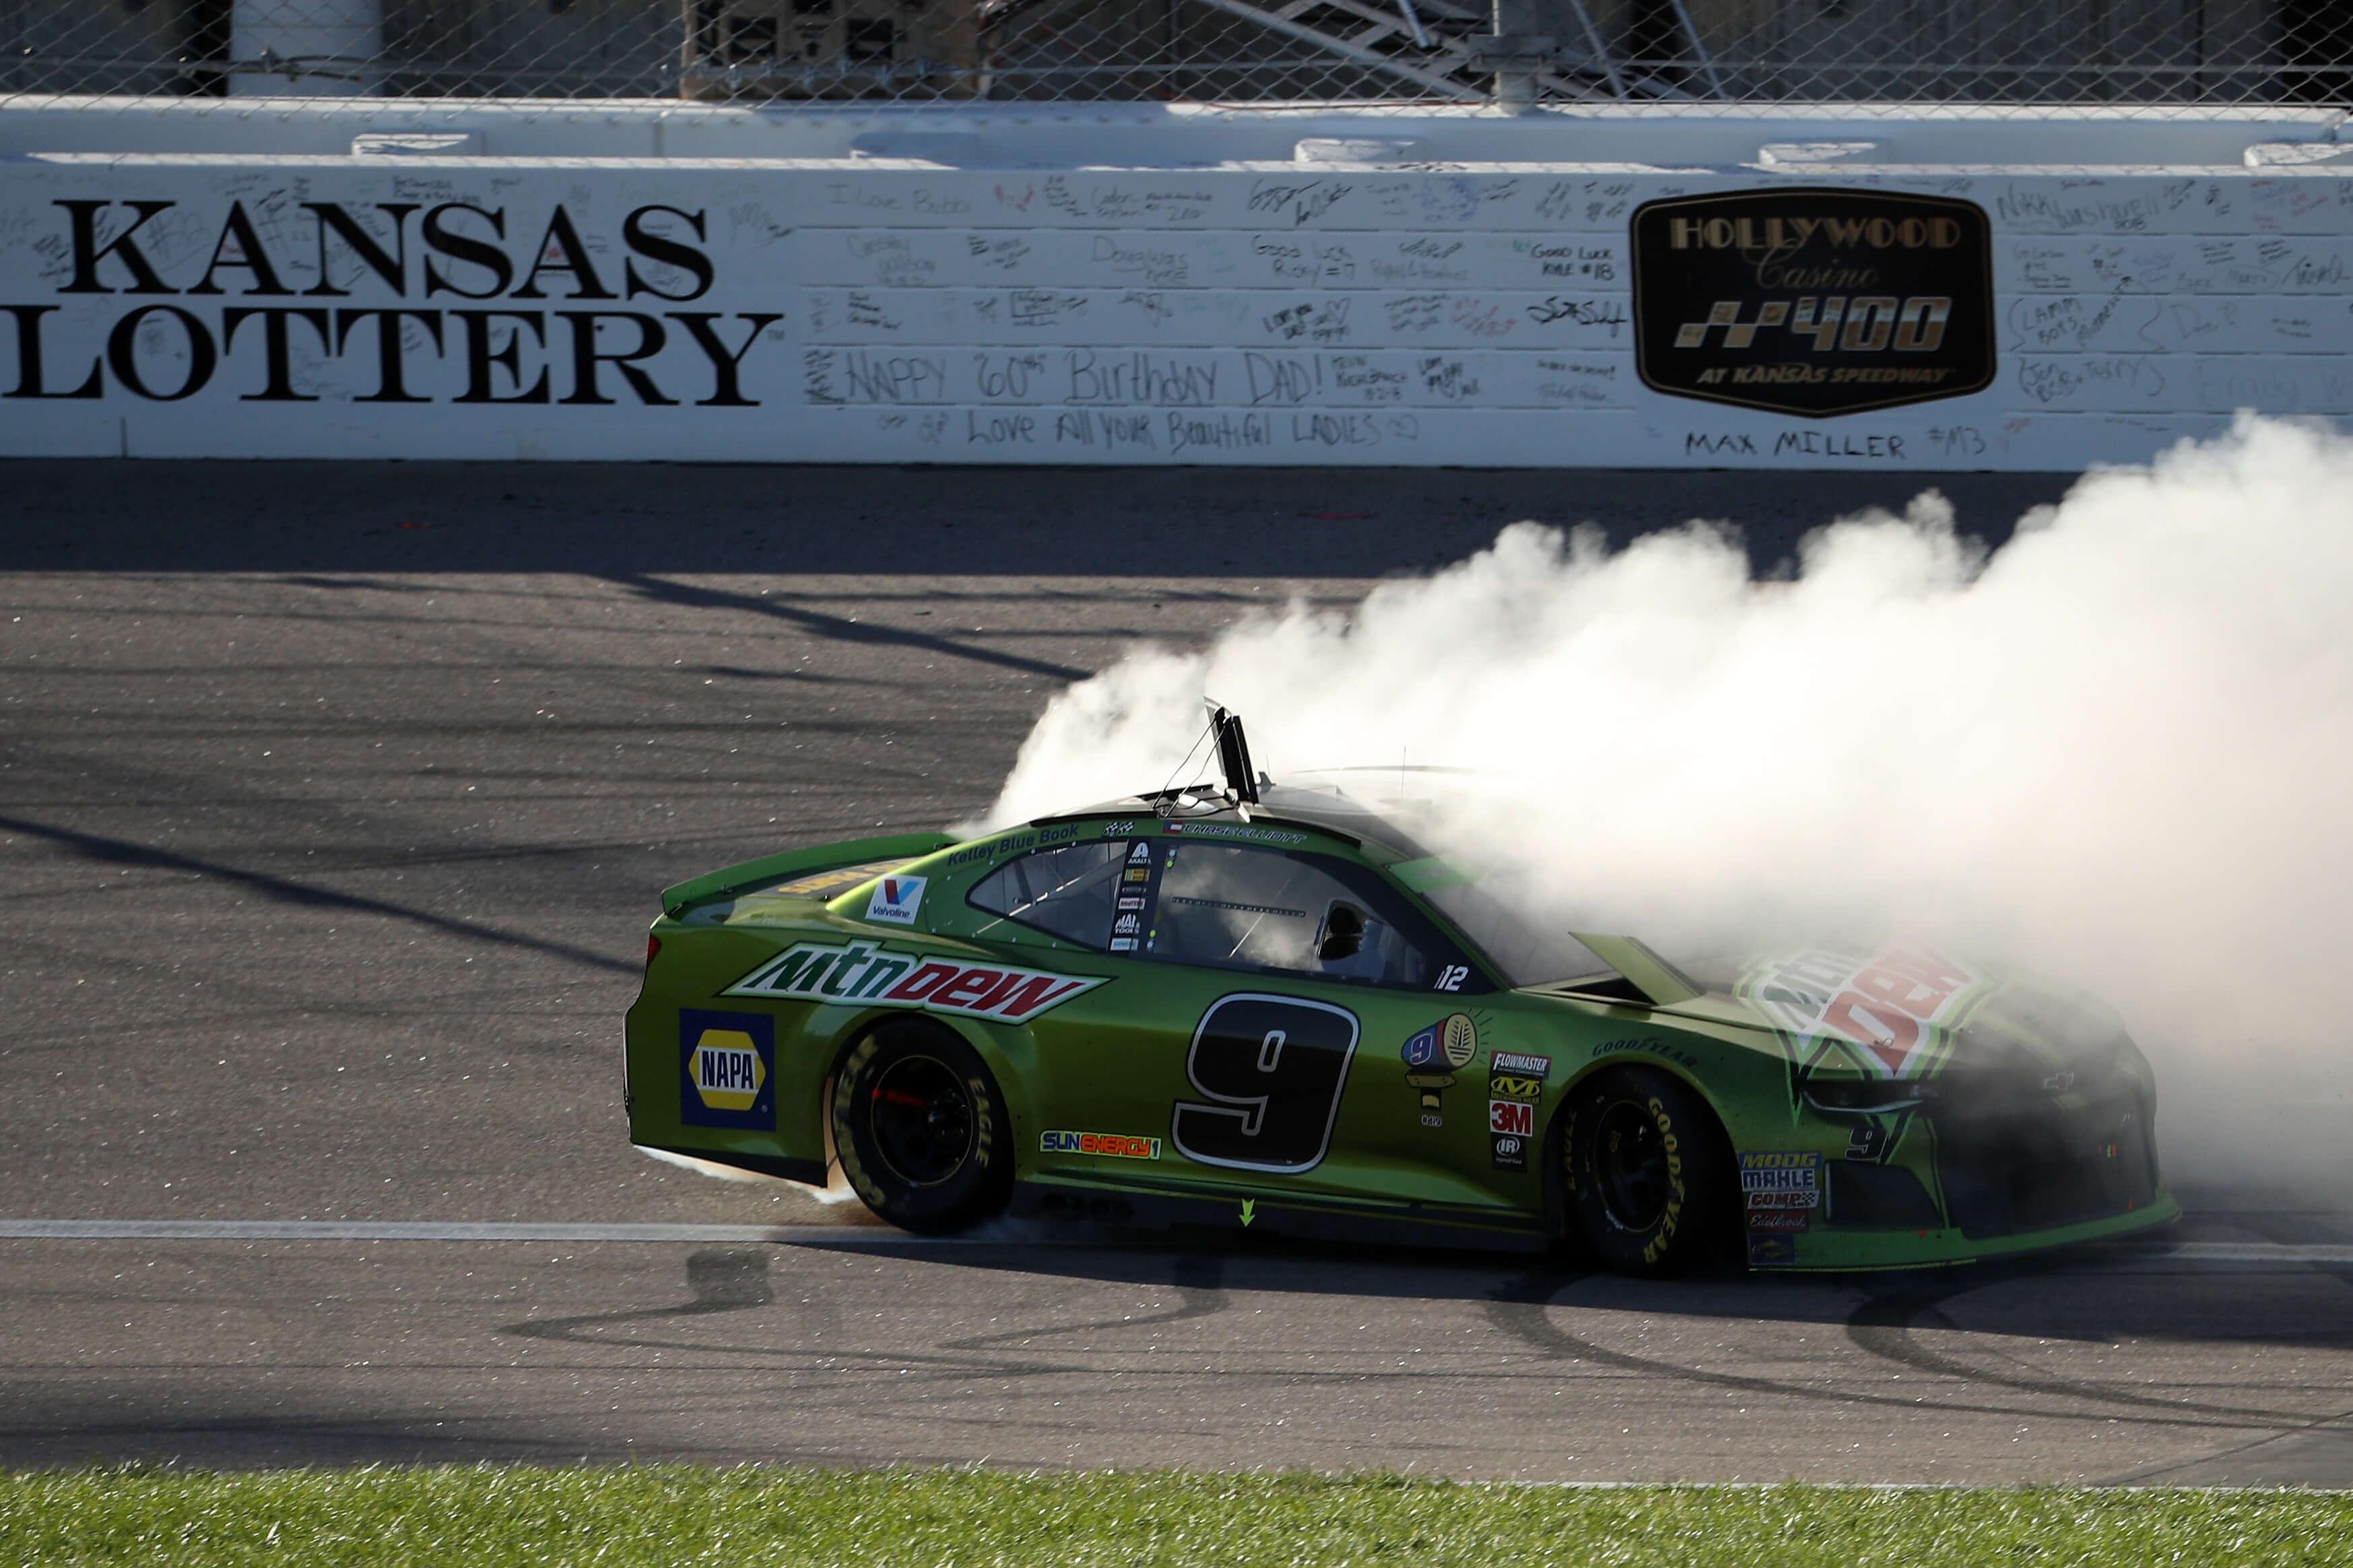 Chase Elliott wins at Kansas Speedway